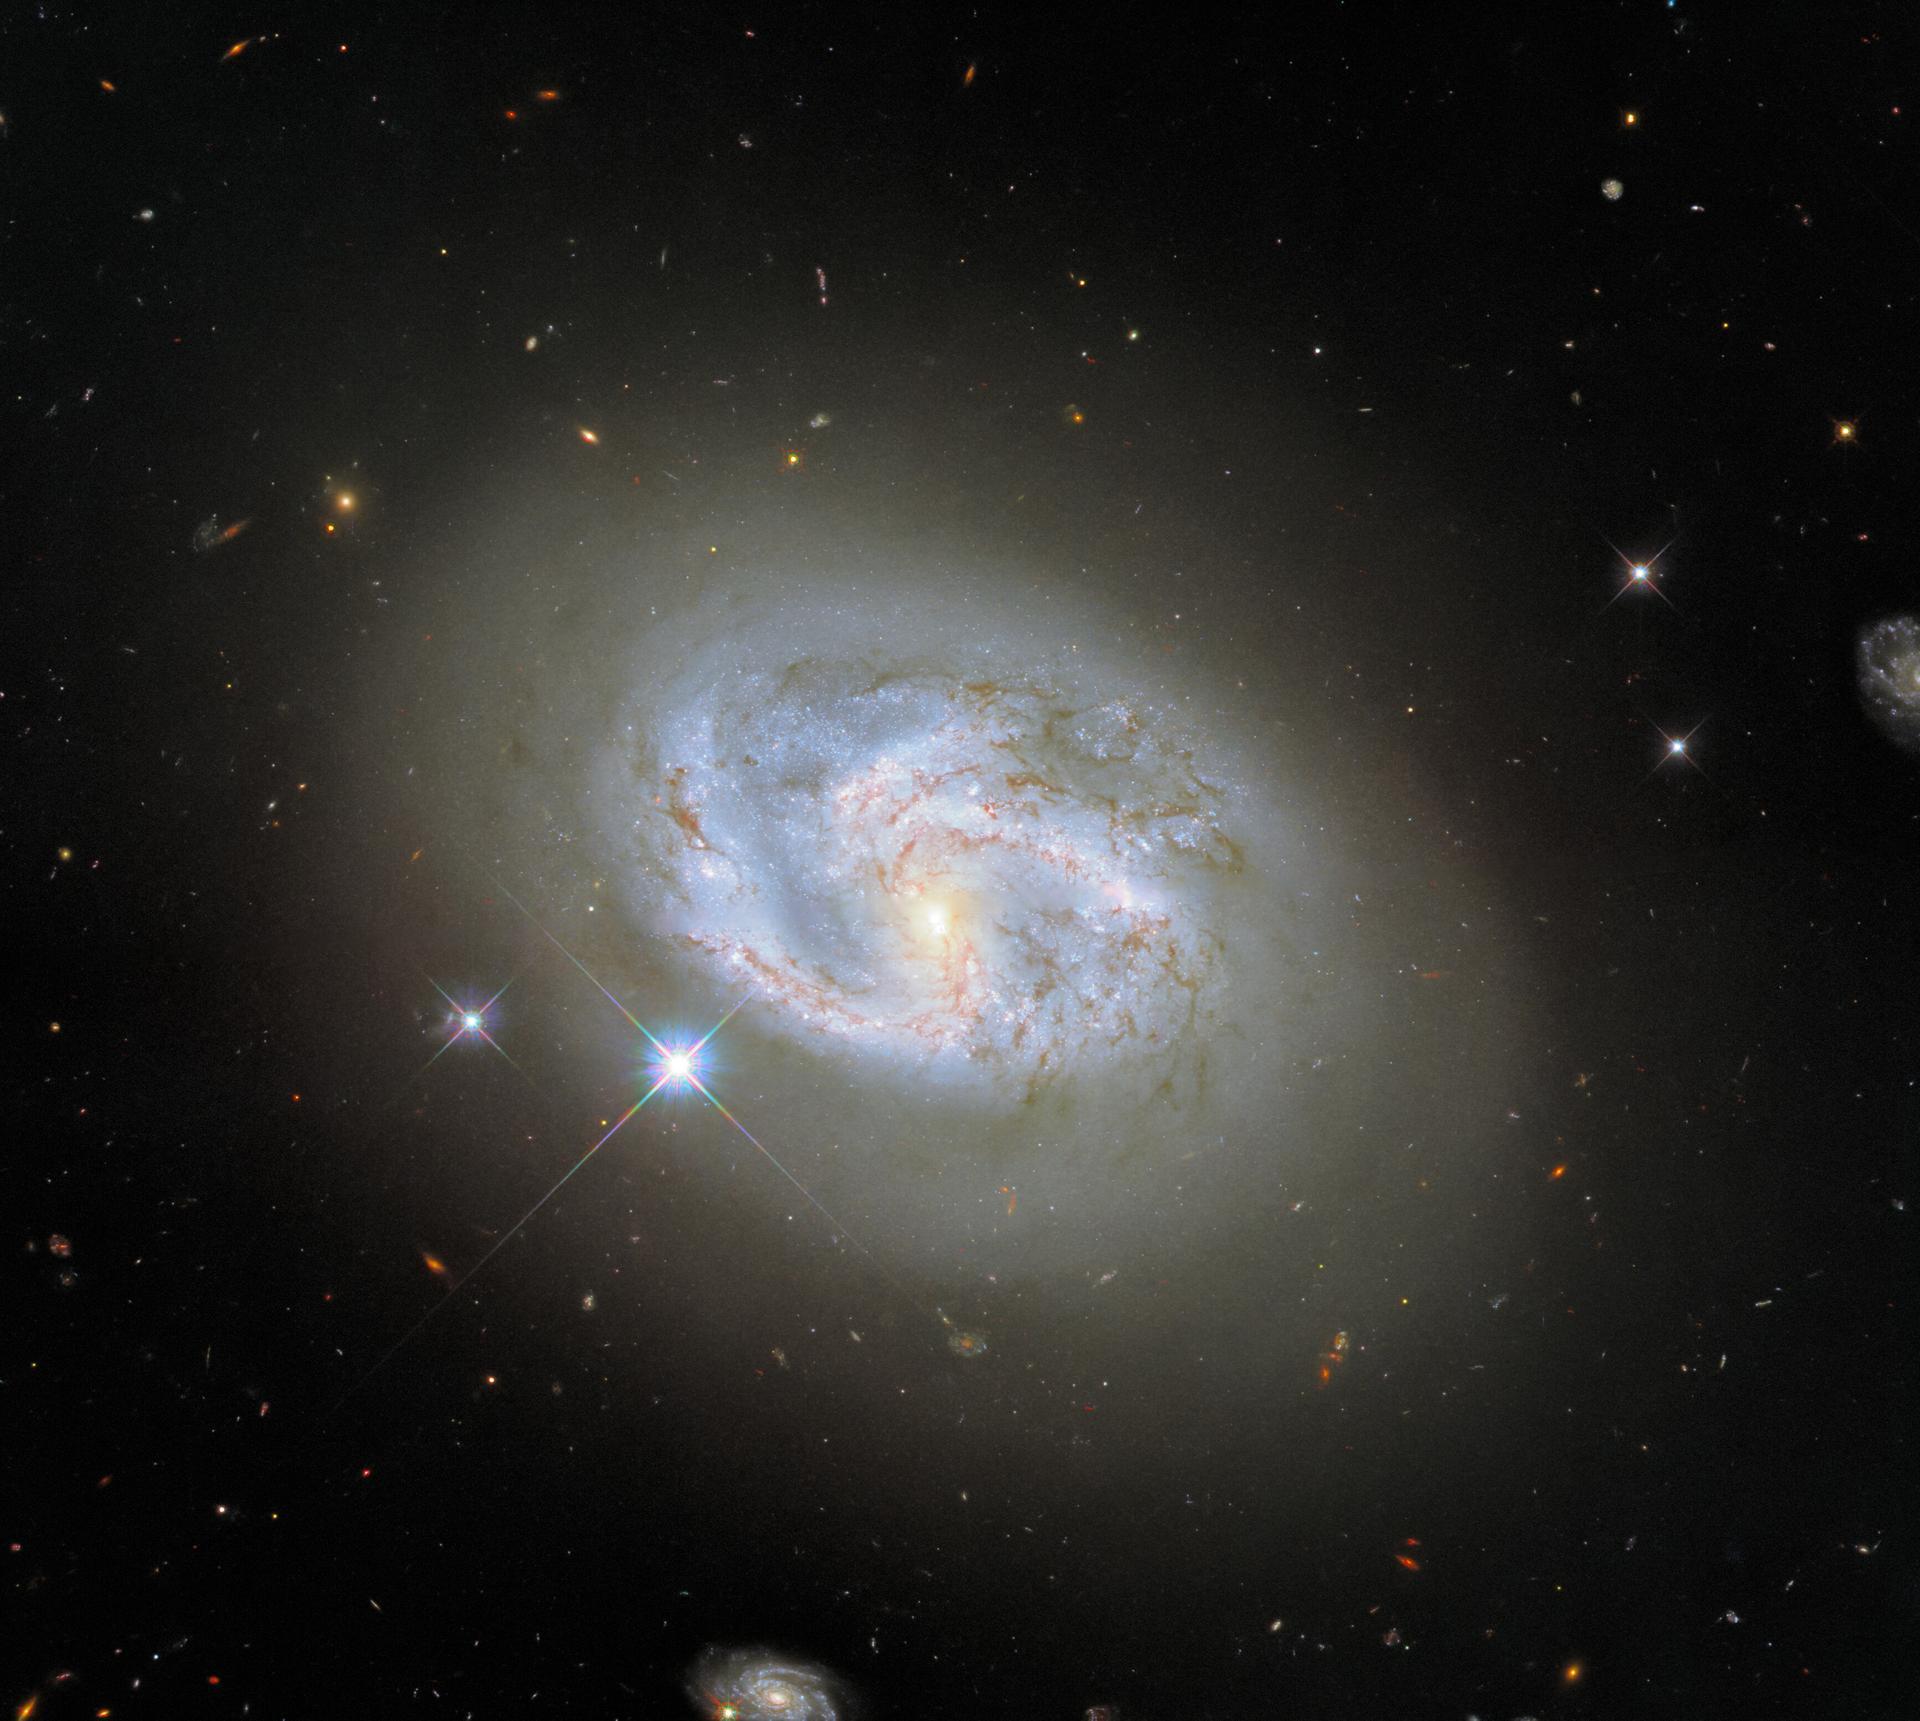 Spiral galaxy NGC 4680